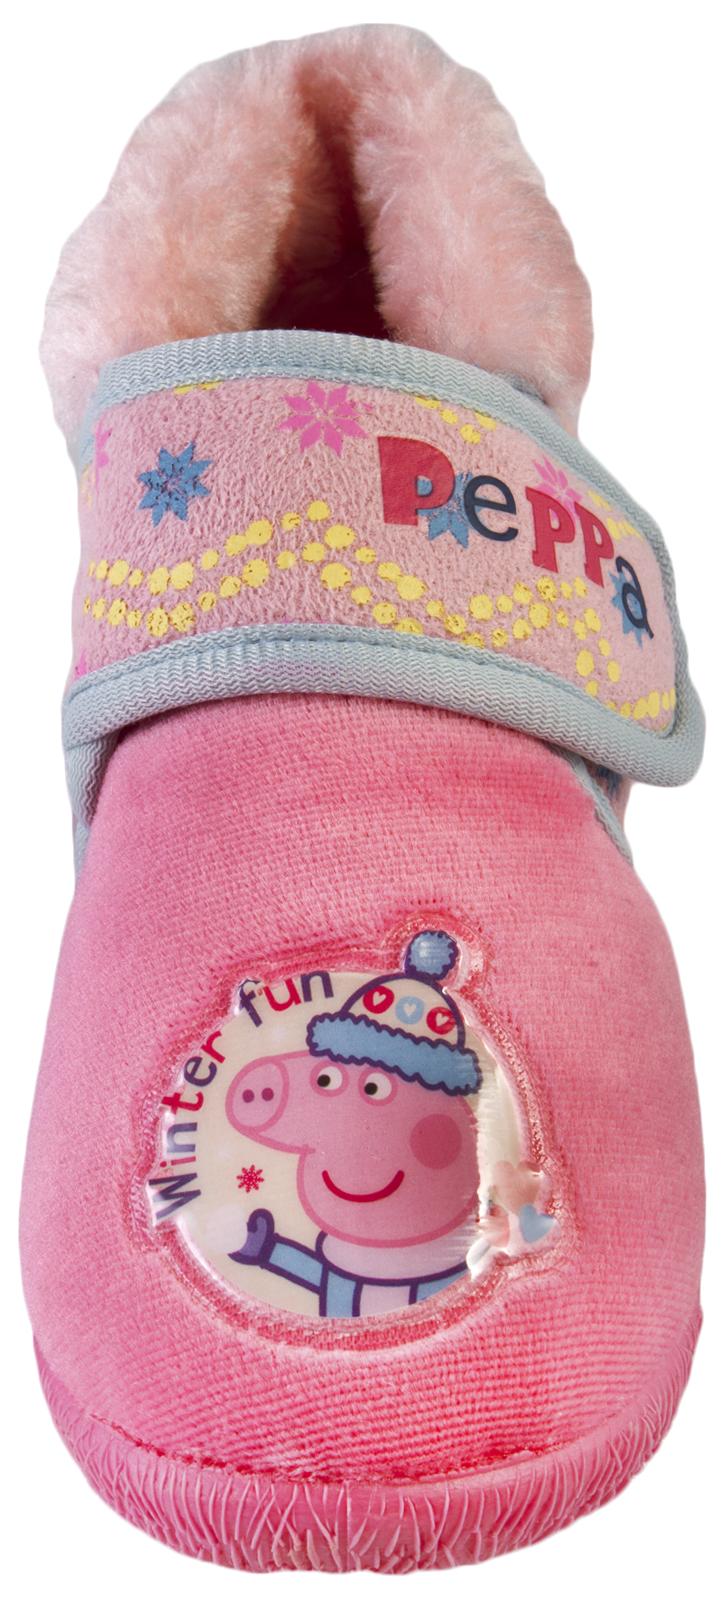 Niños Niñas Peppa Pig Novedad Pantuflas Polar carácter Botas Regalo Talla Uk 4 - 11